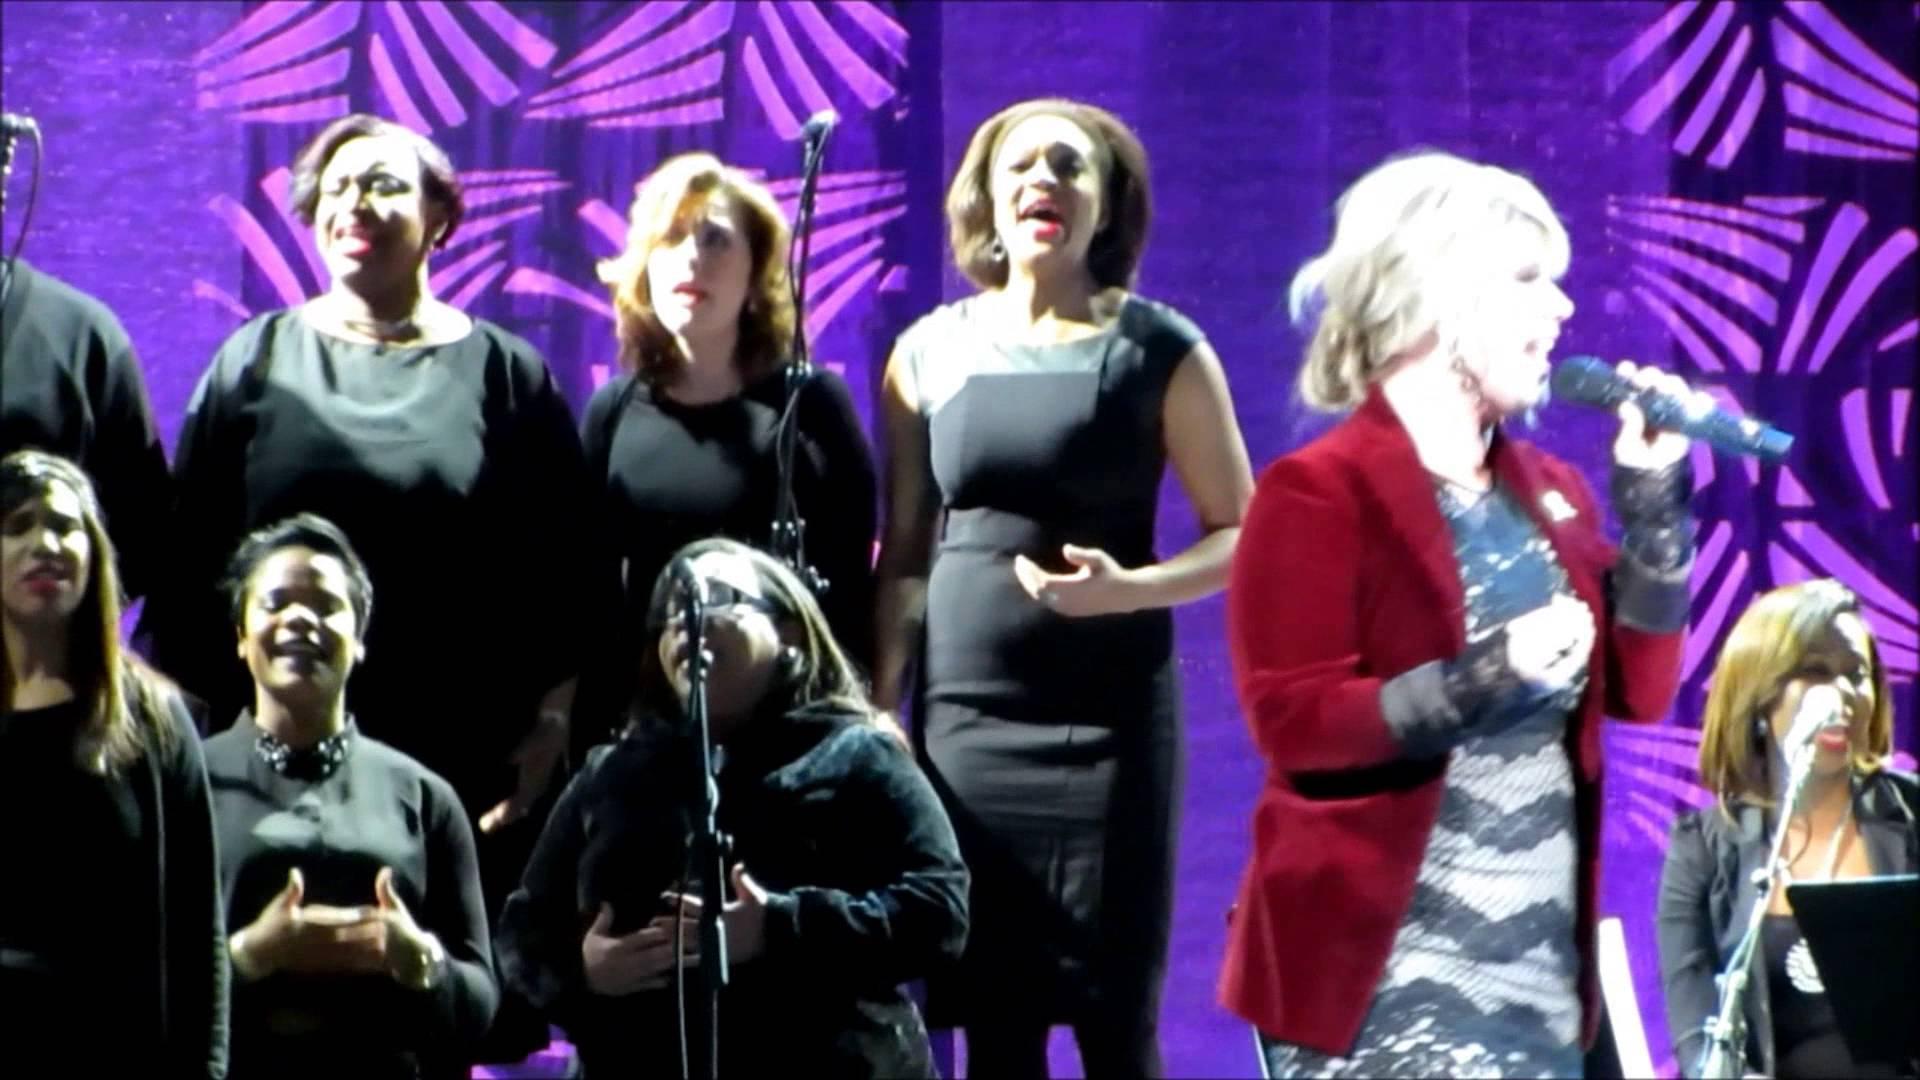 2014 Superbowl Gospel Celebration – Natalie Grant Breathe on Me/ I Need Thee